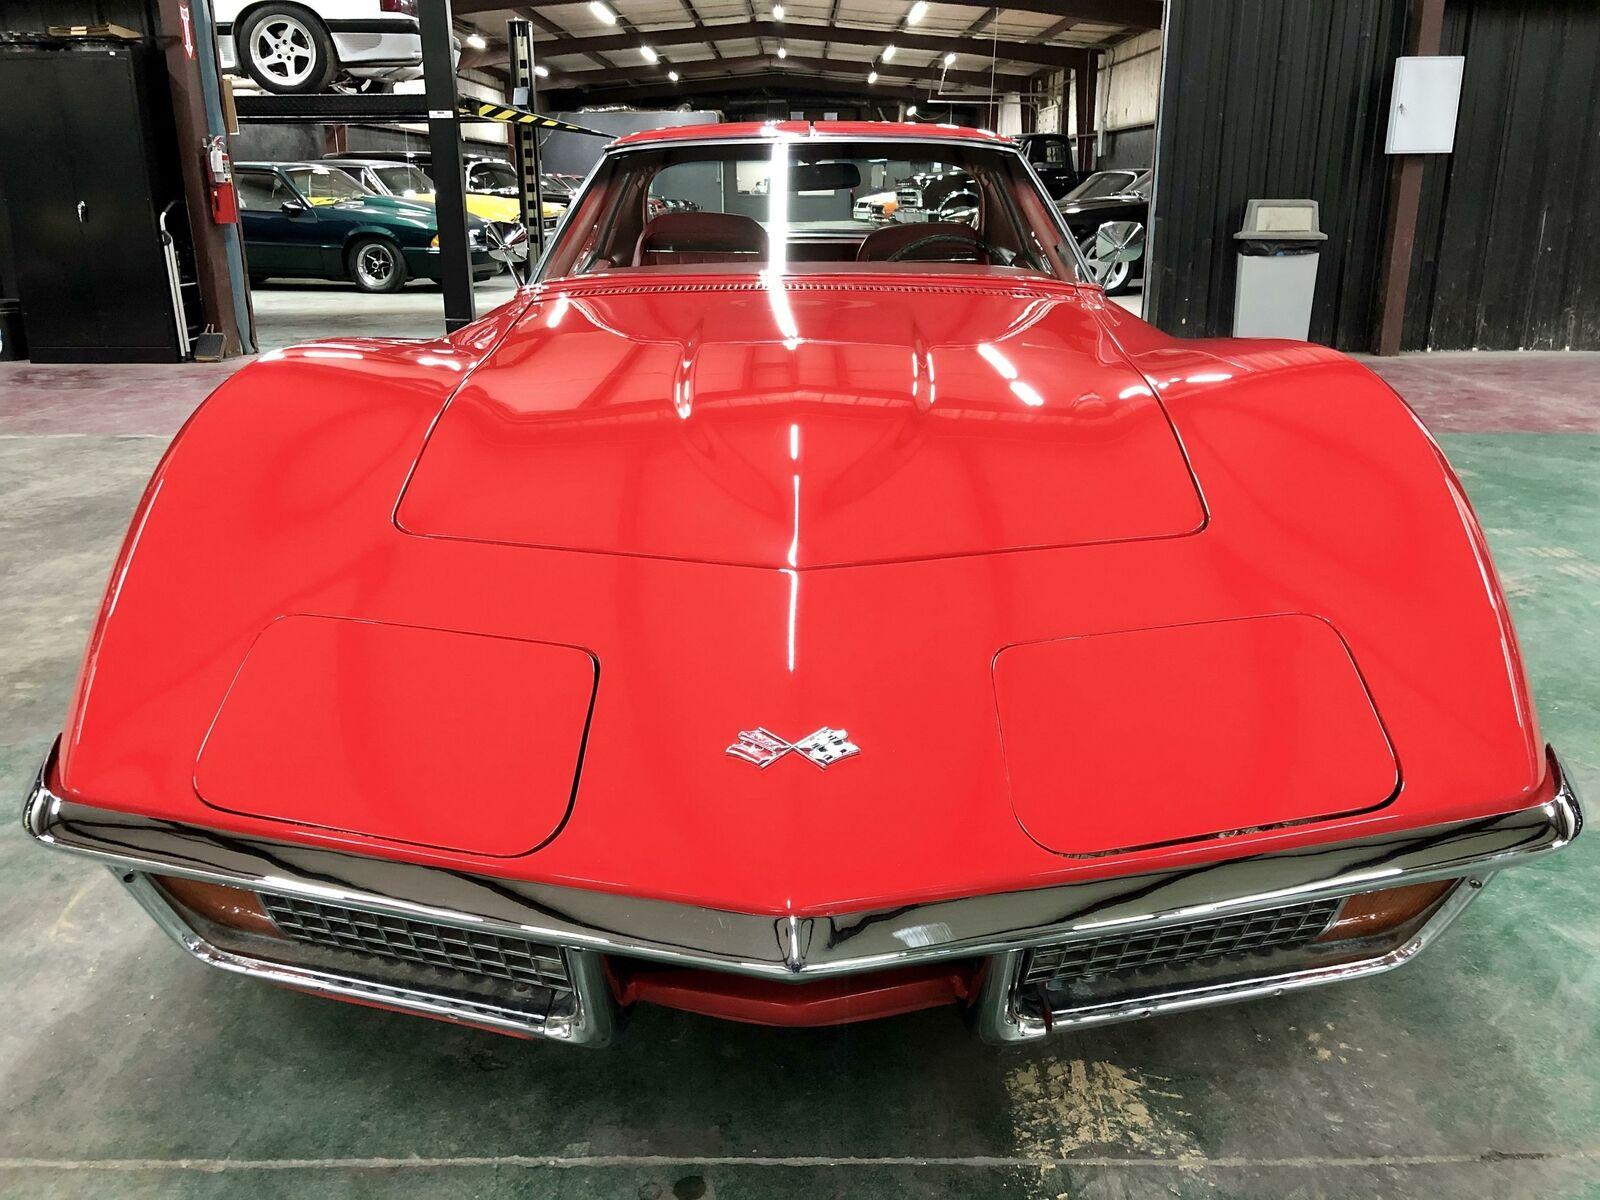 1972 Red Chevrolet Corvette     C3 Corvette Photo 8